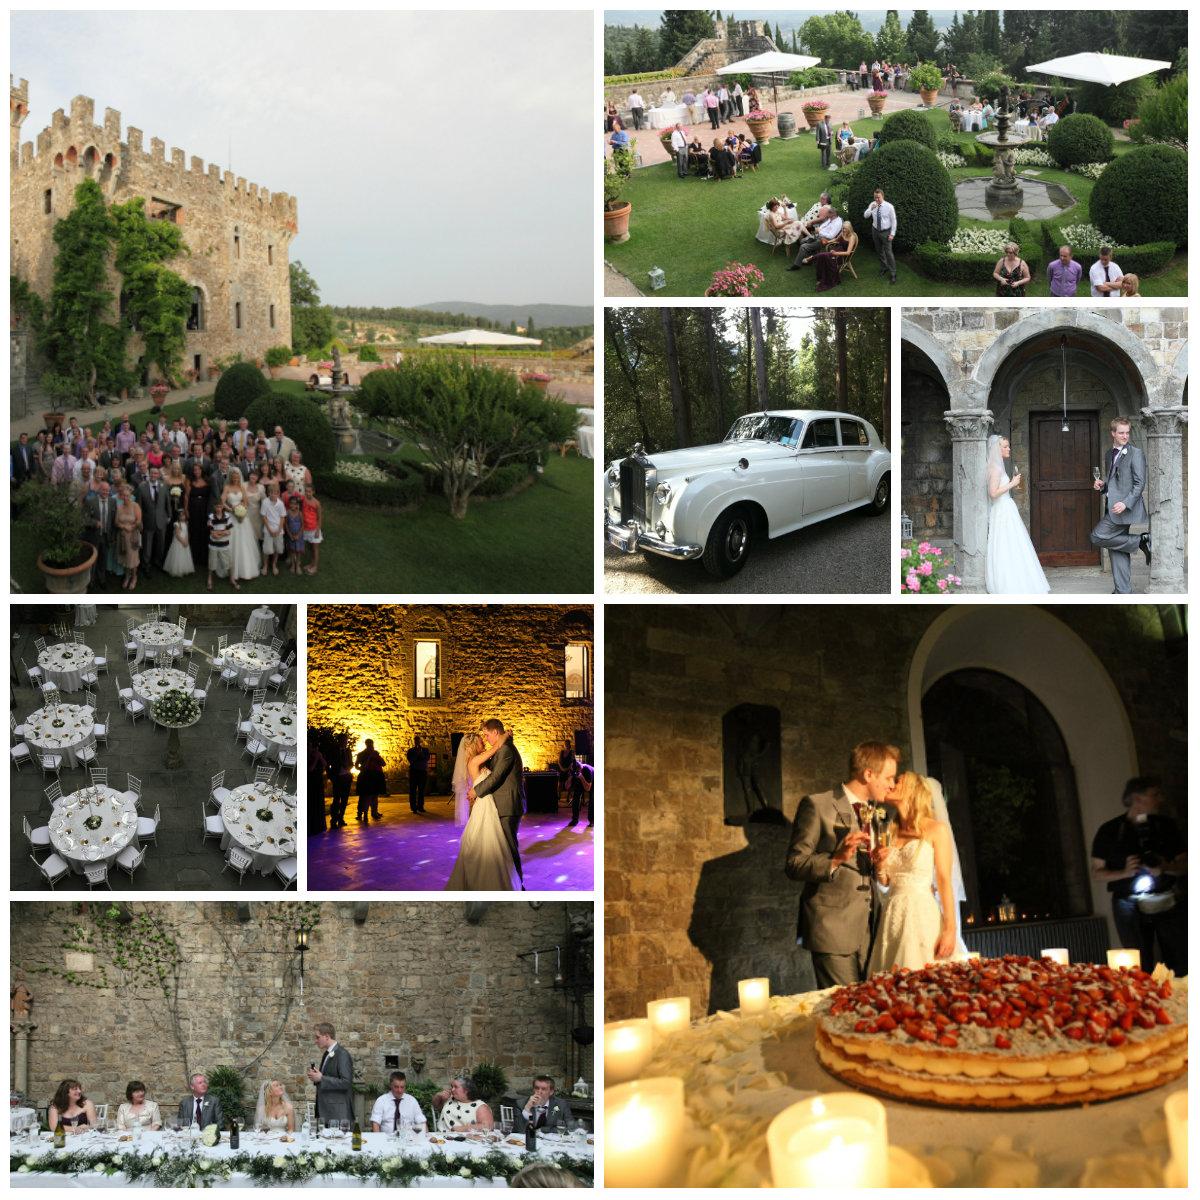 Wedding celebration in Florence